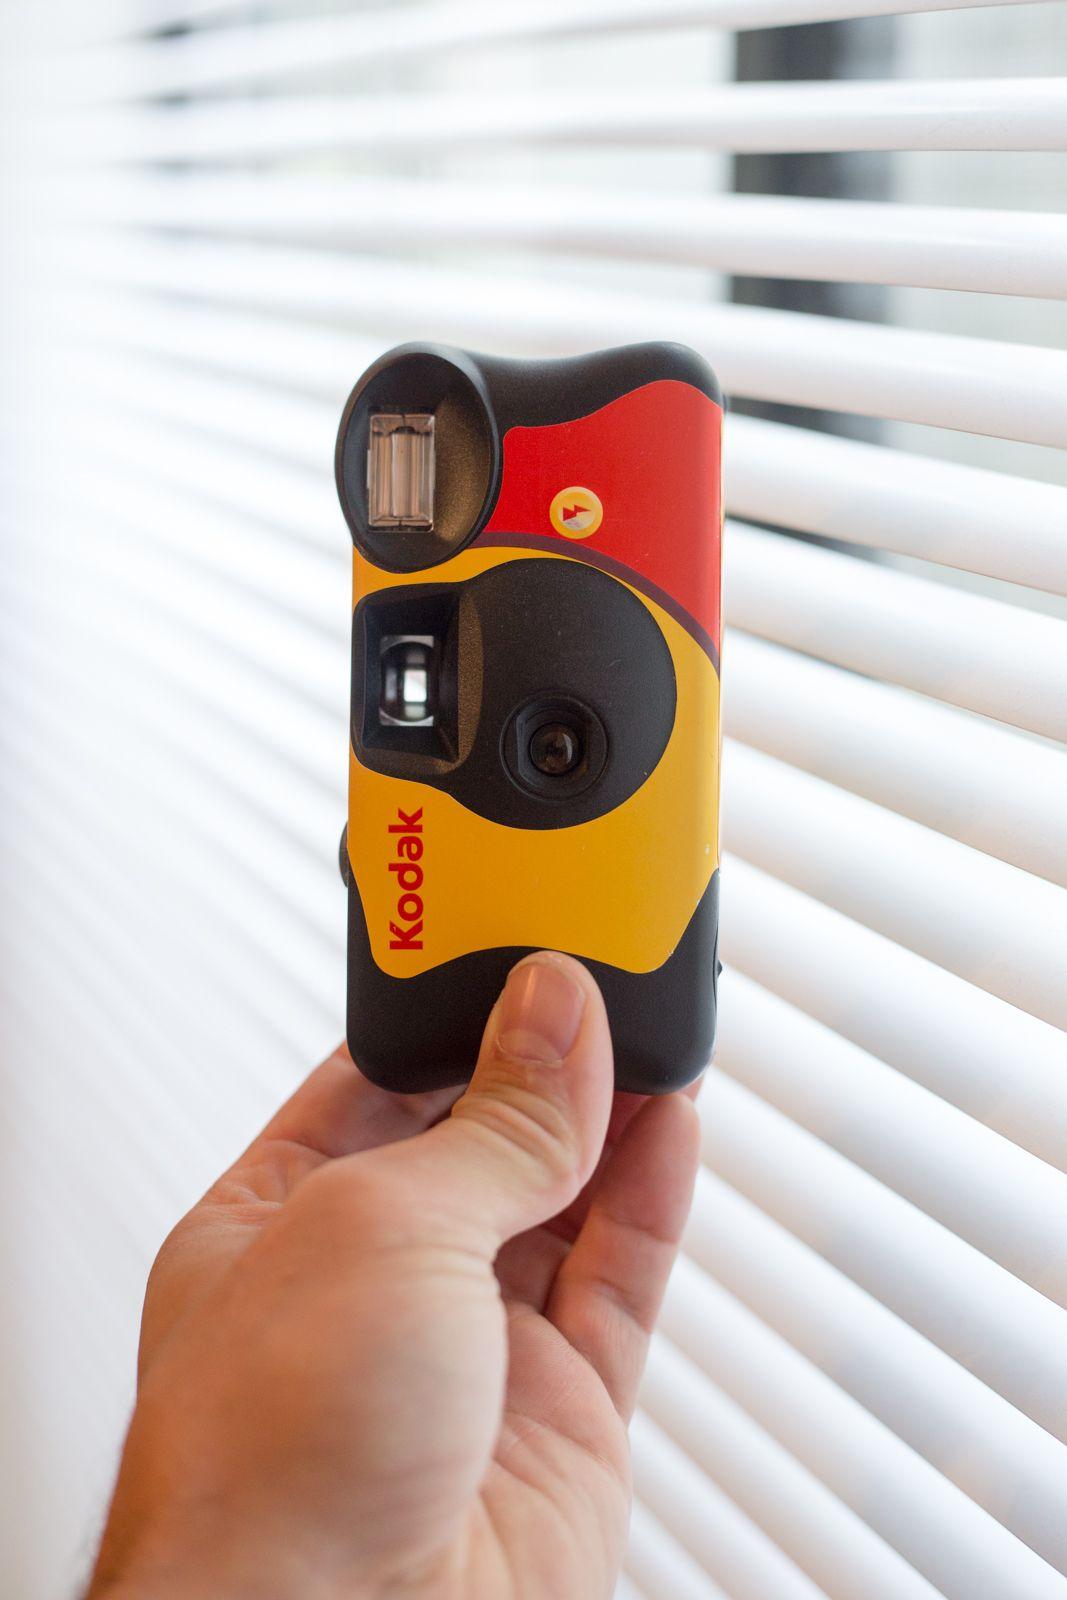 Kodak fun saver single use disposable camera review